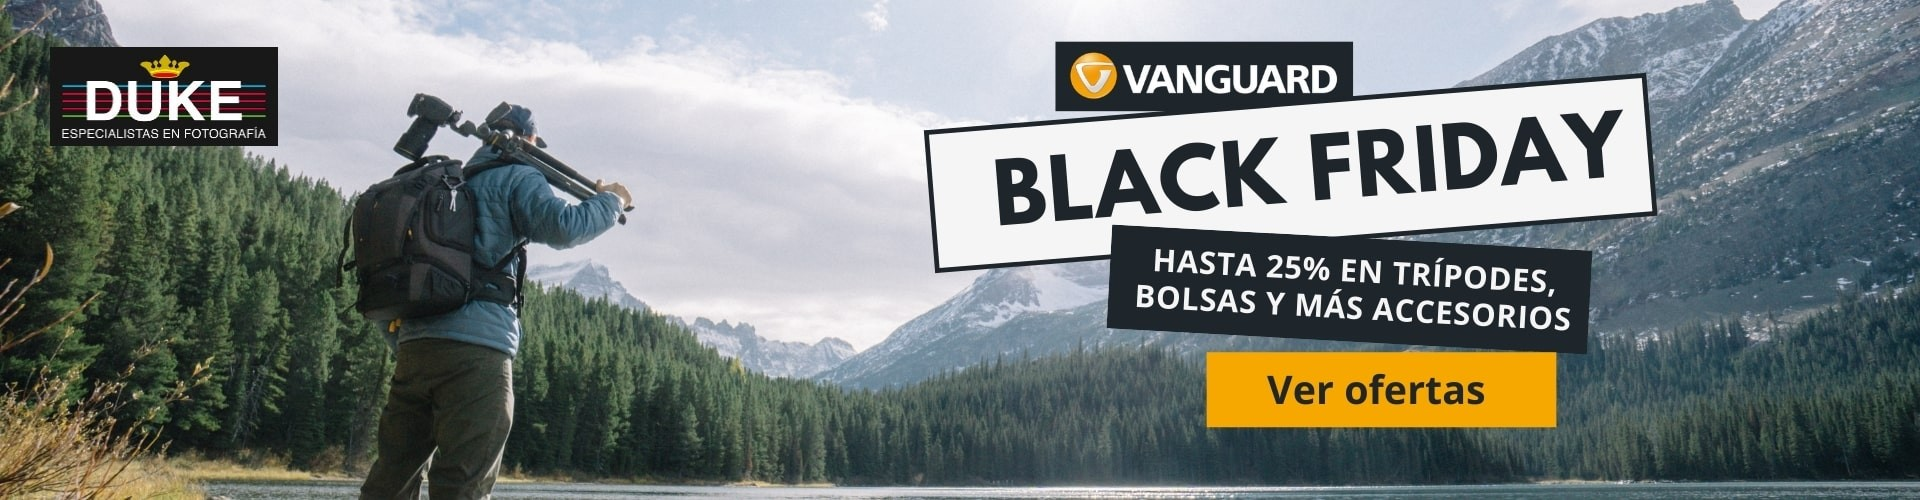 Vanguard 25%